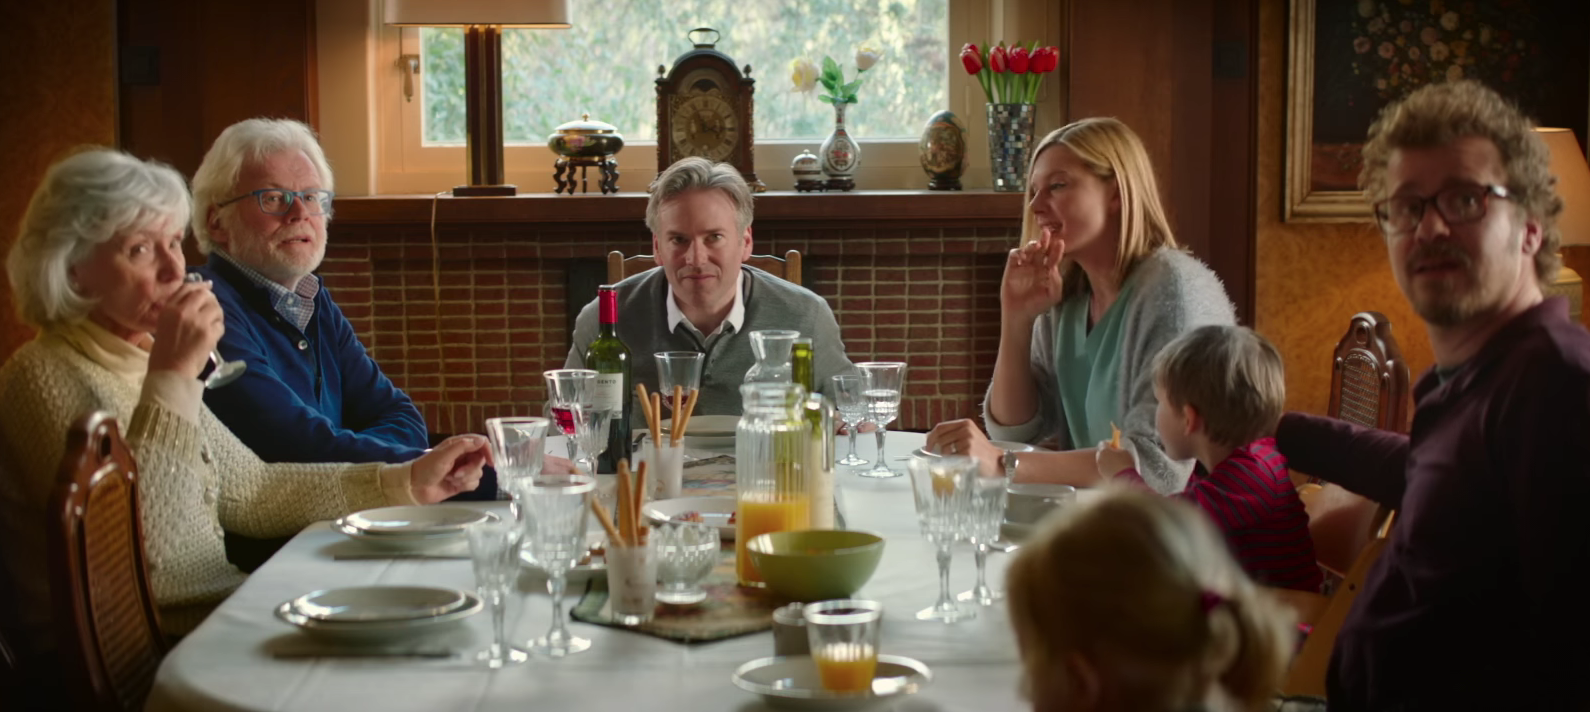 Trailer Allemaal familie